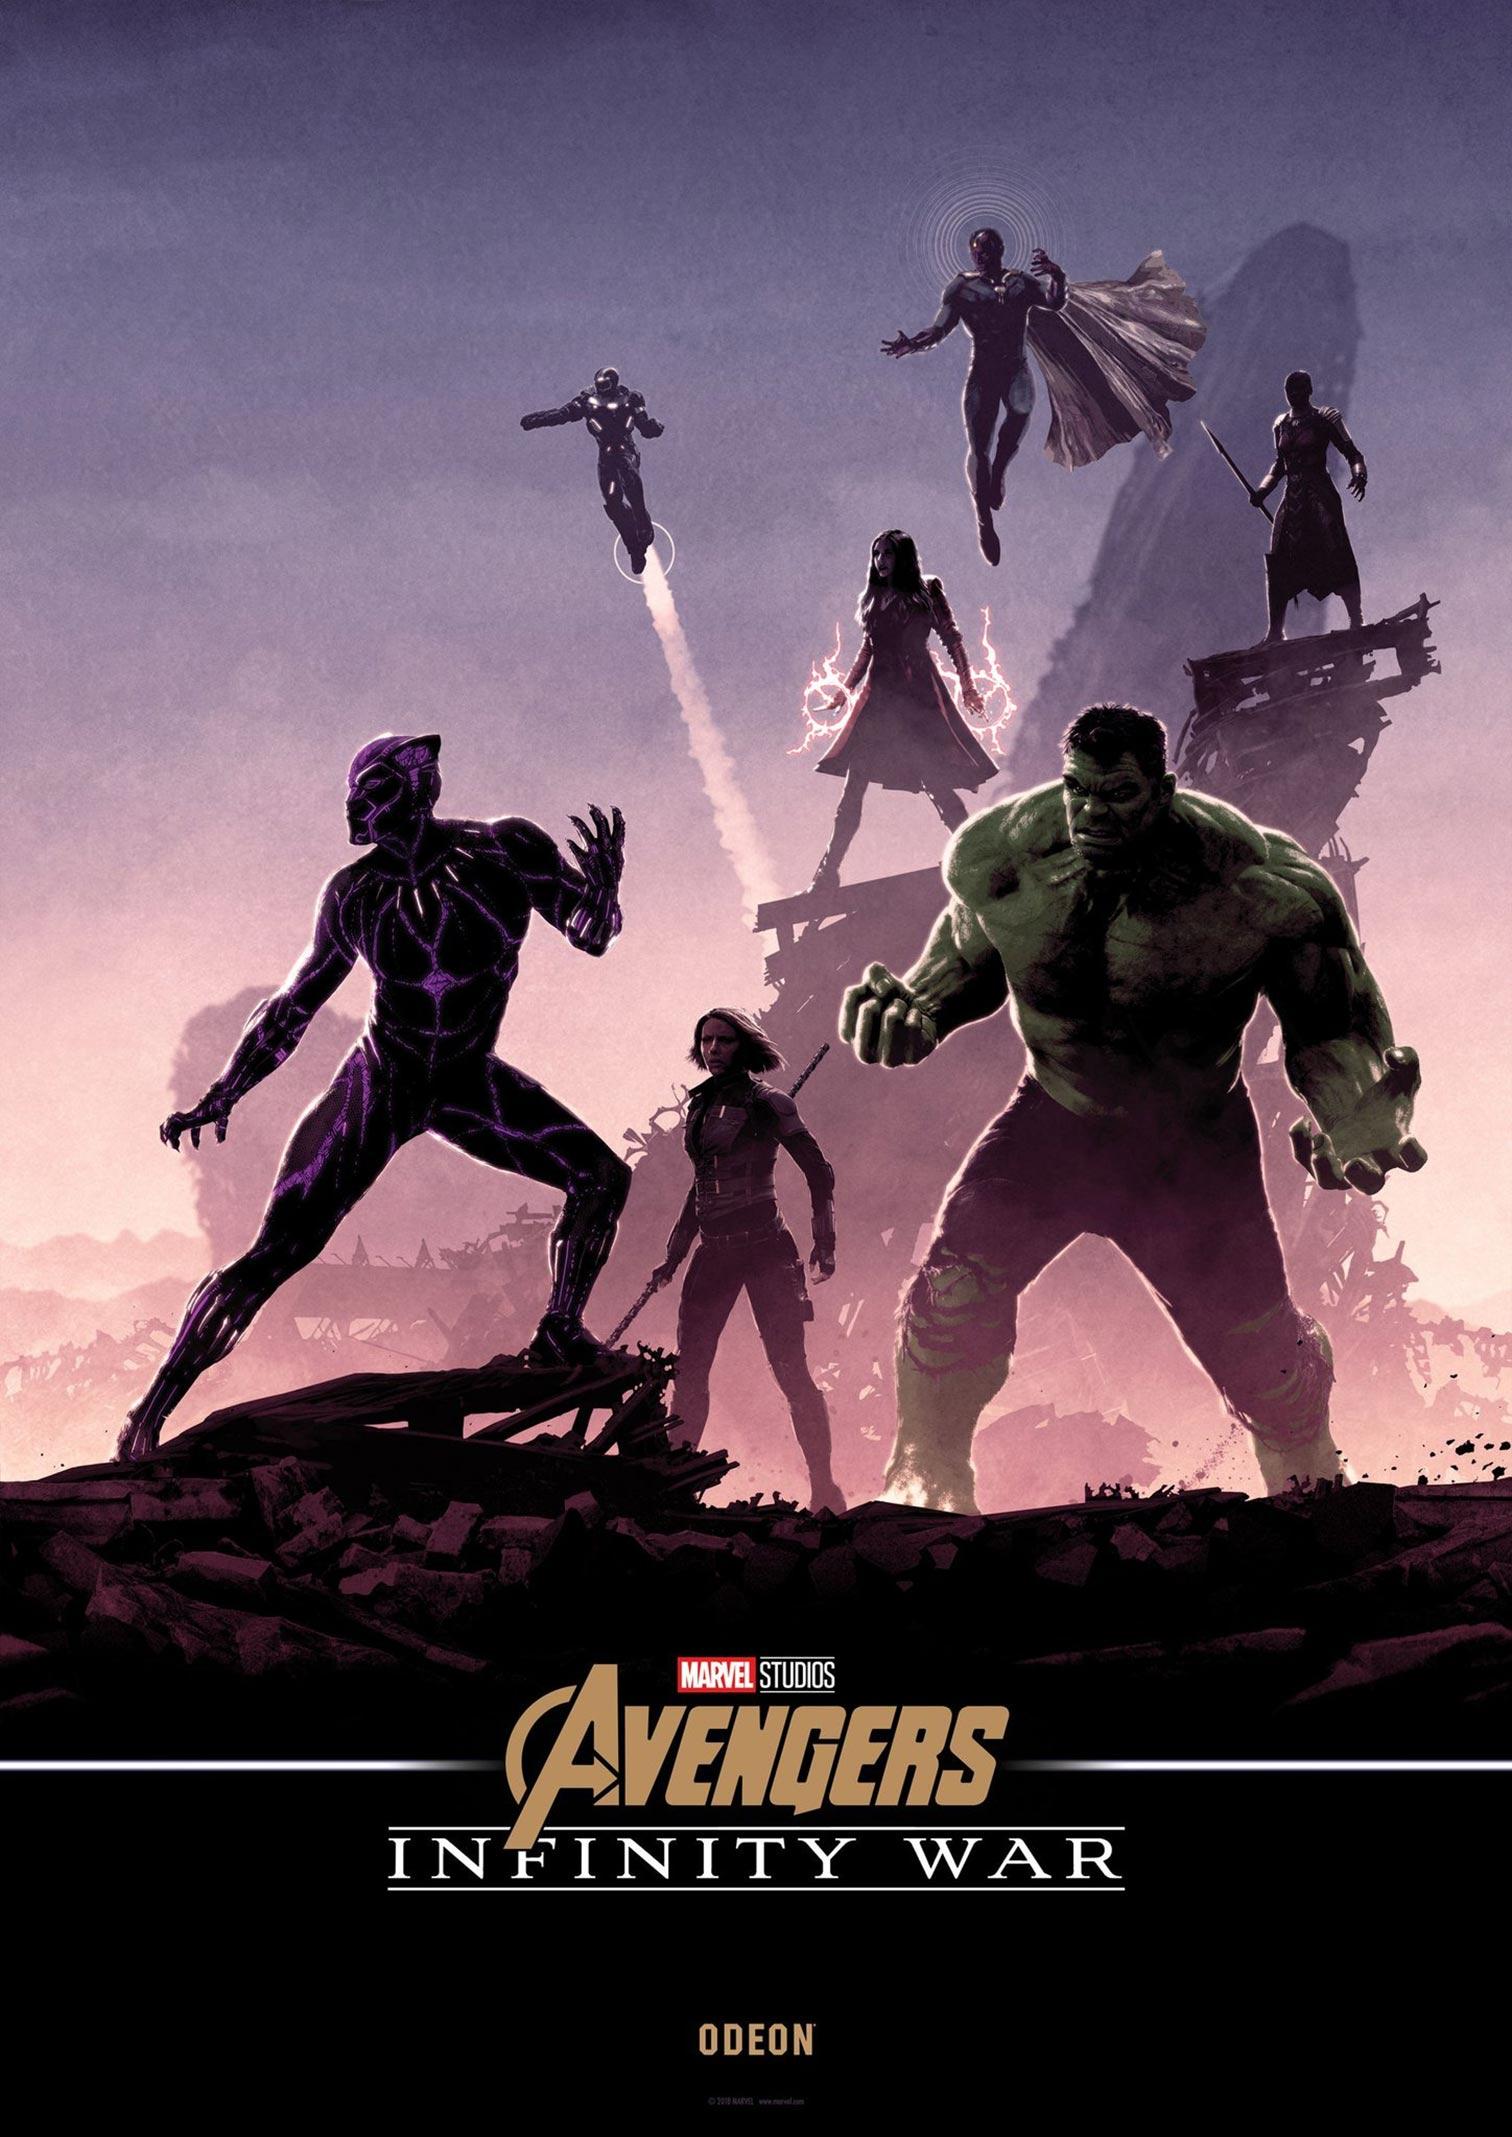 Avengers: Infinity War Poster #34